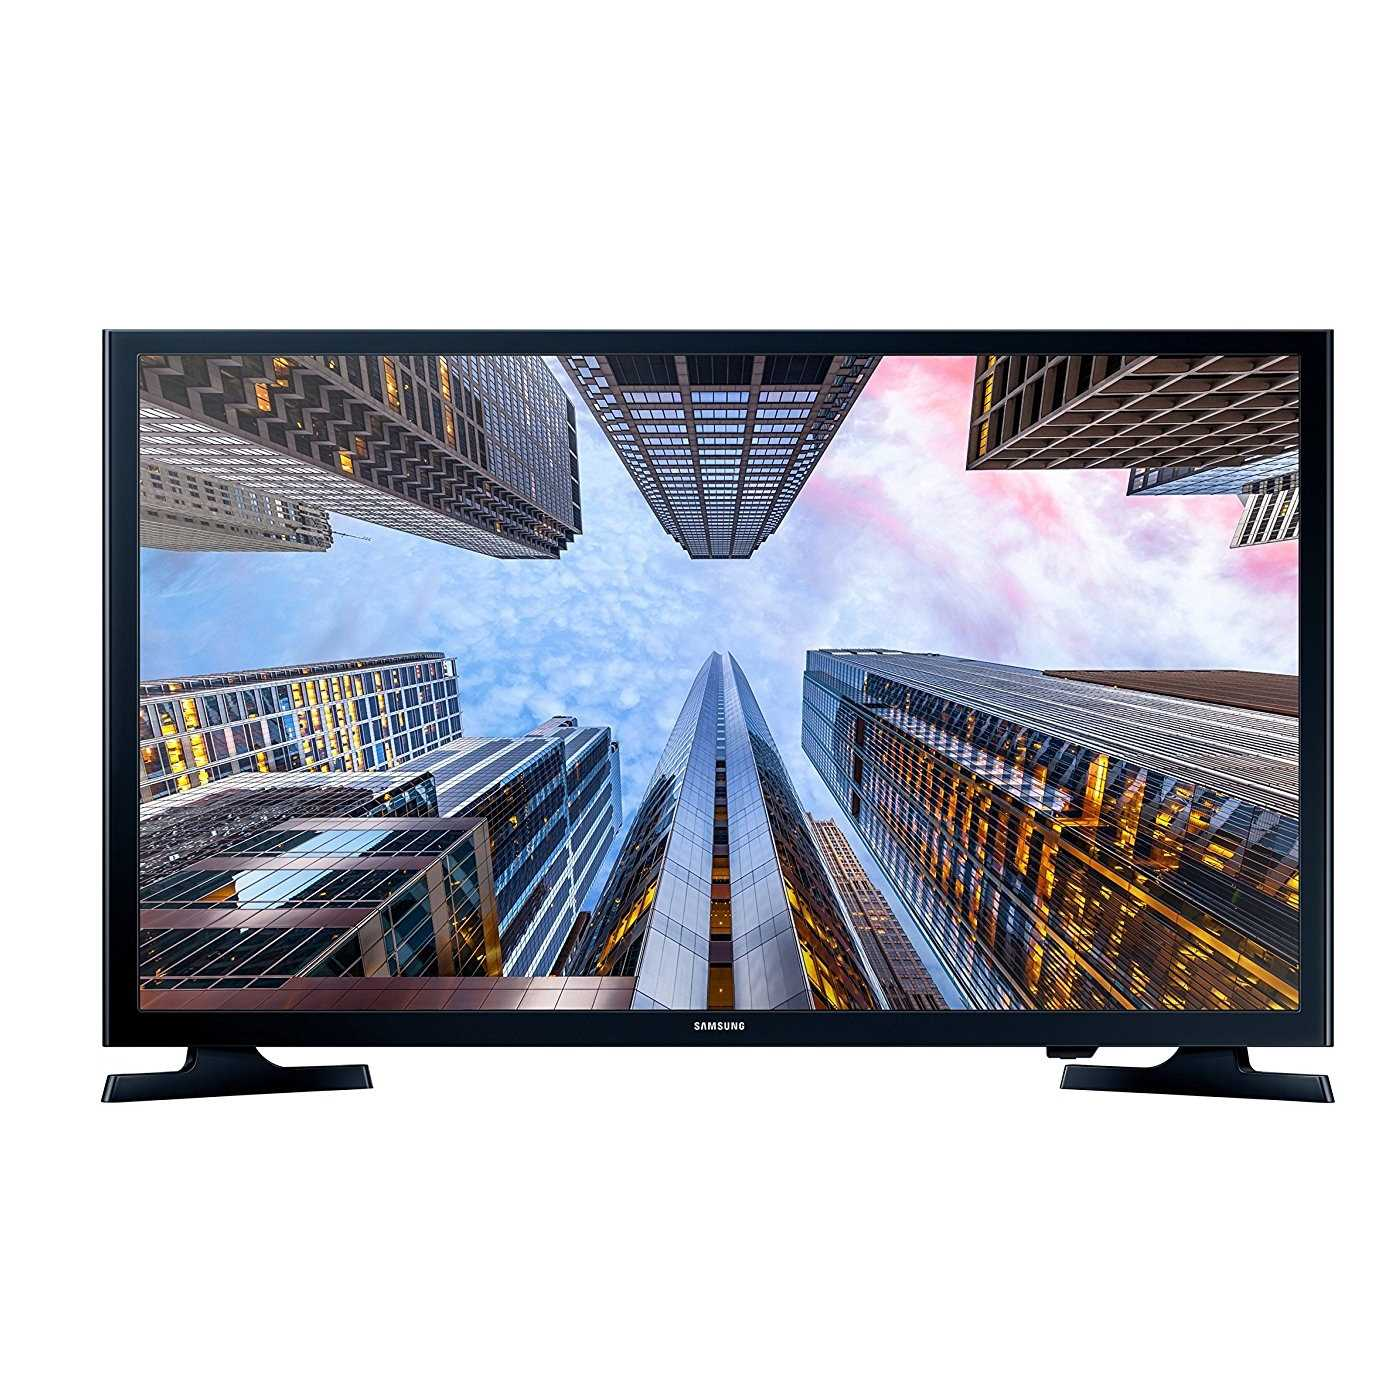 Samsung 32M4000 32 Inch HD Ready LED Television